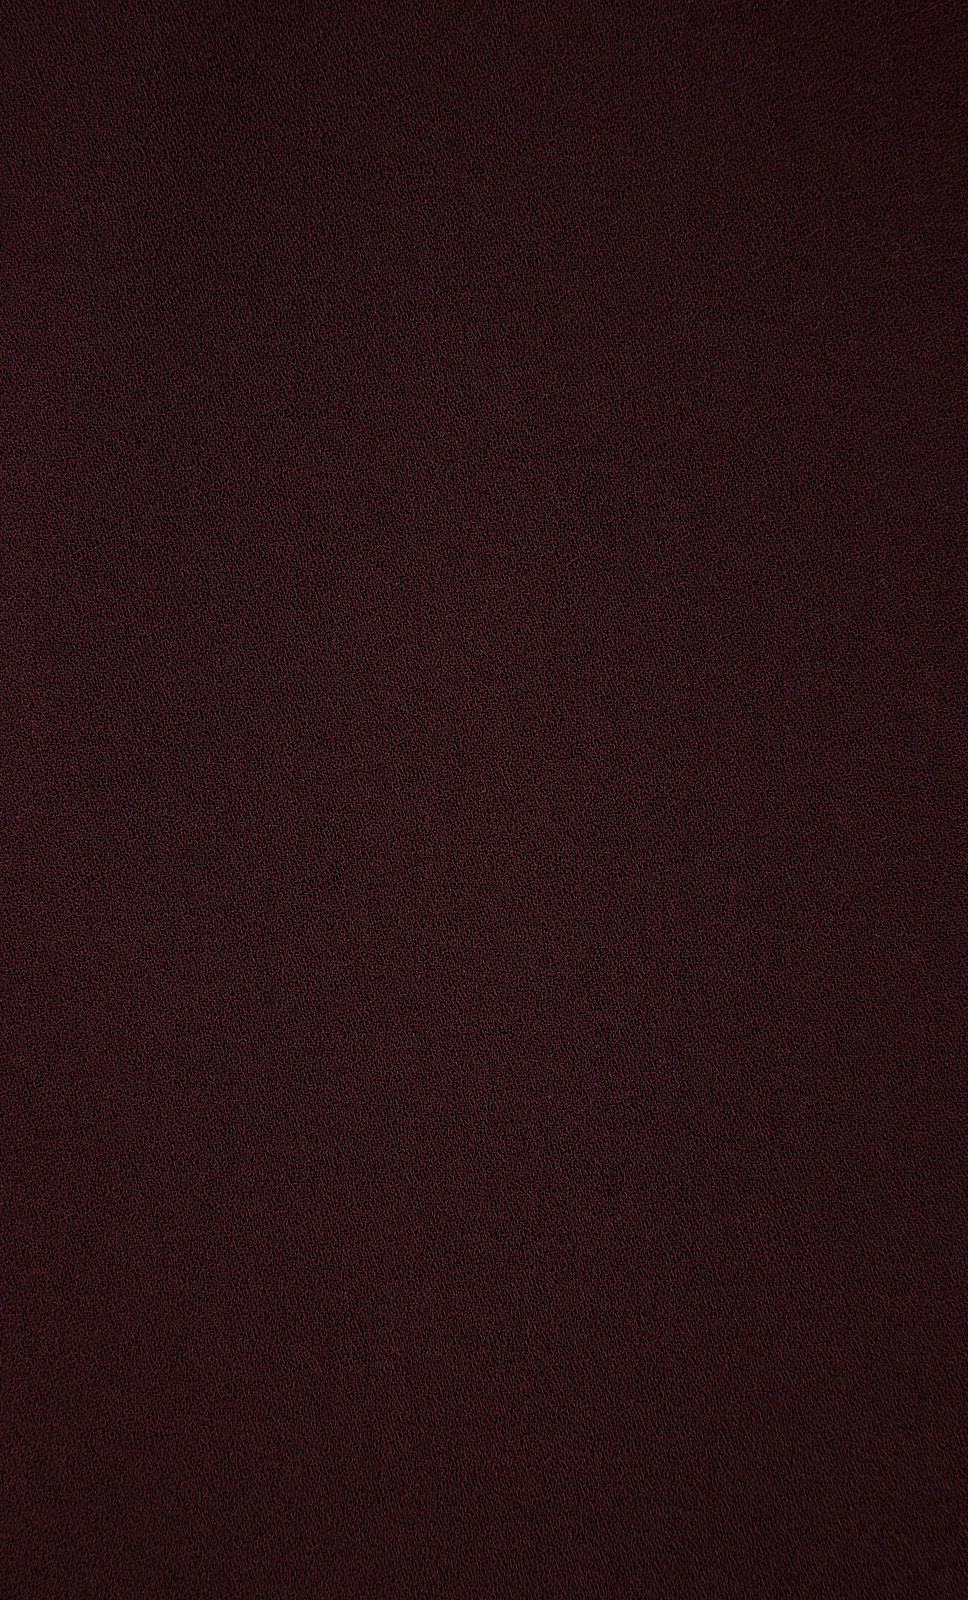 Woven-Crepe-Grape-Red